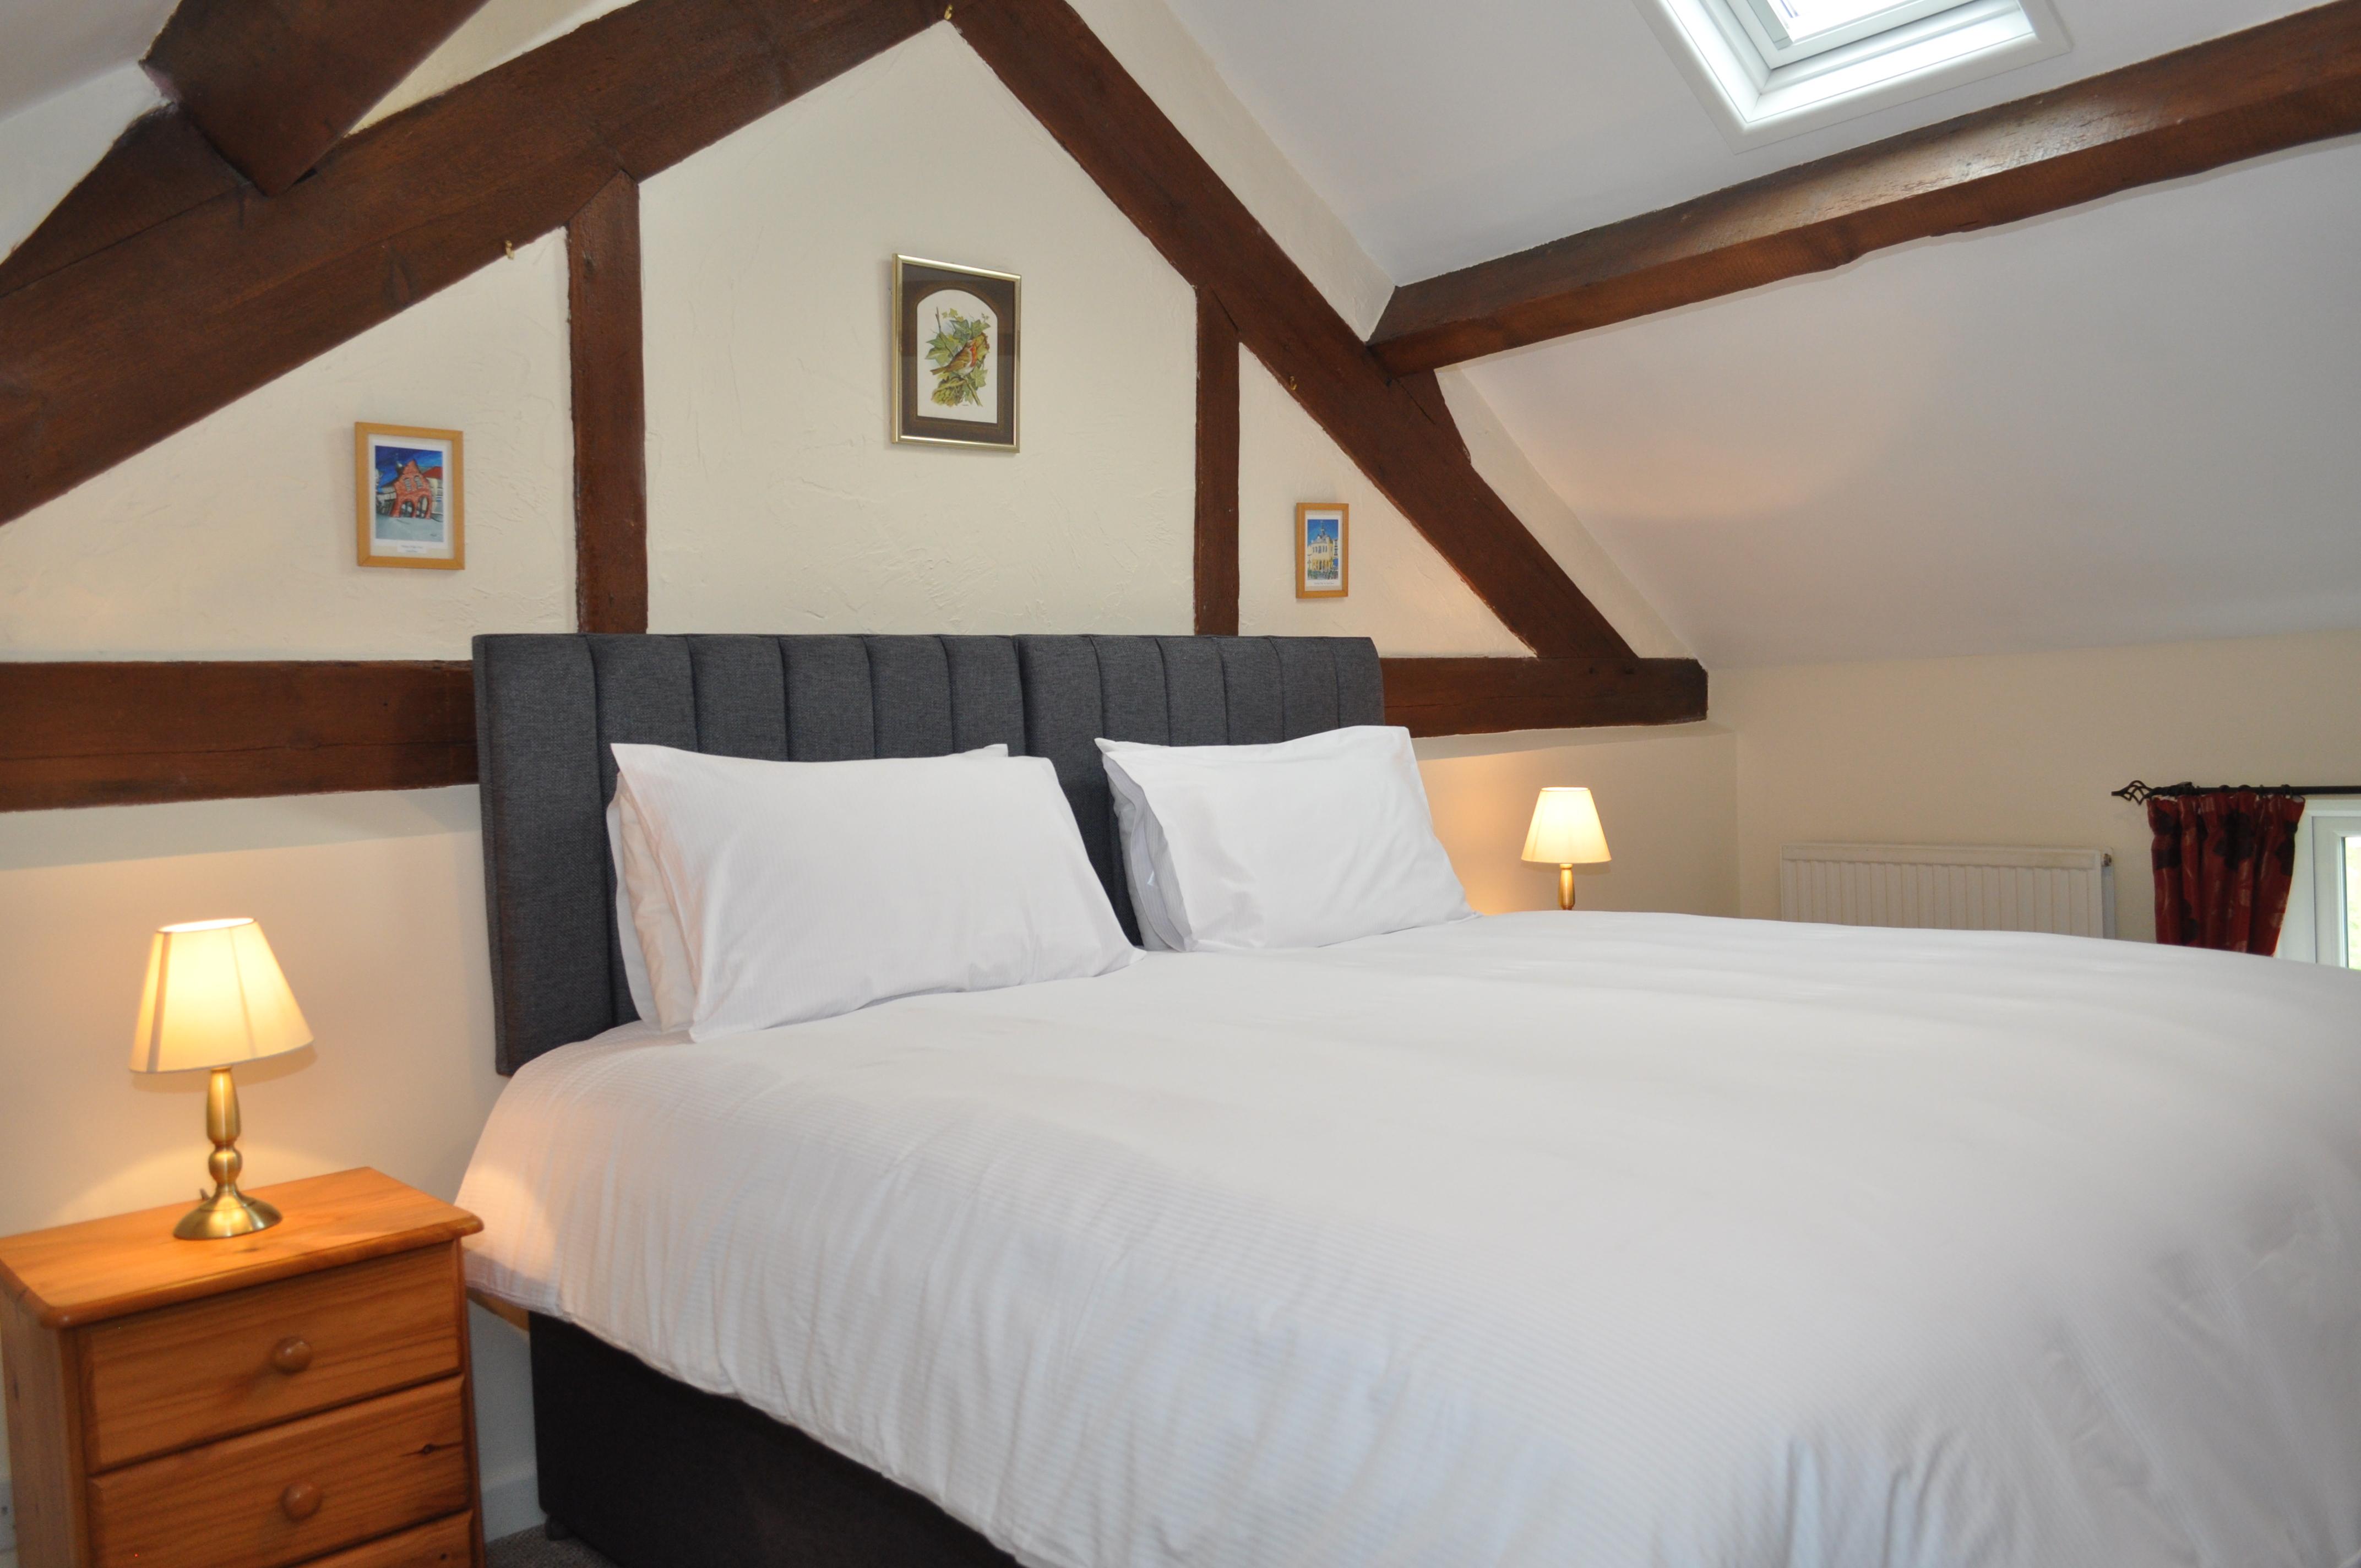 Zip & Link Beds made up as Superking